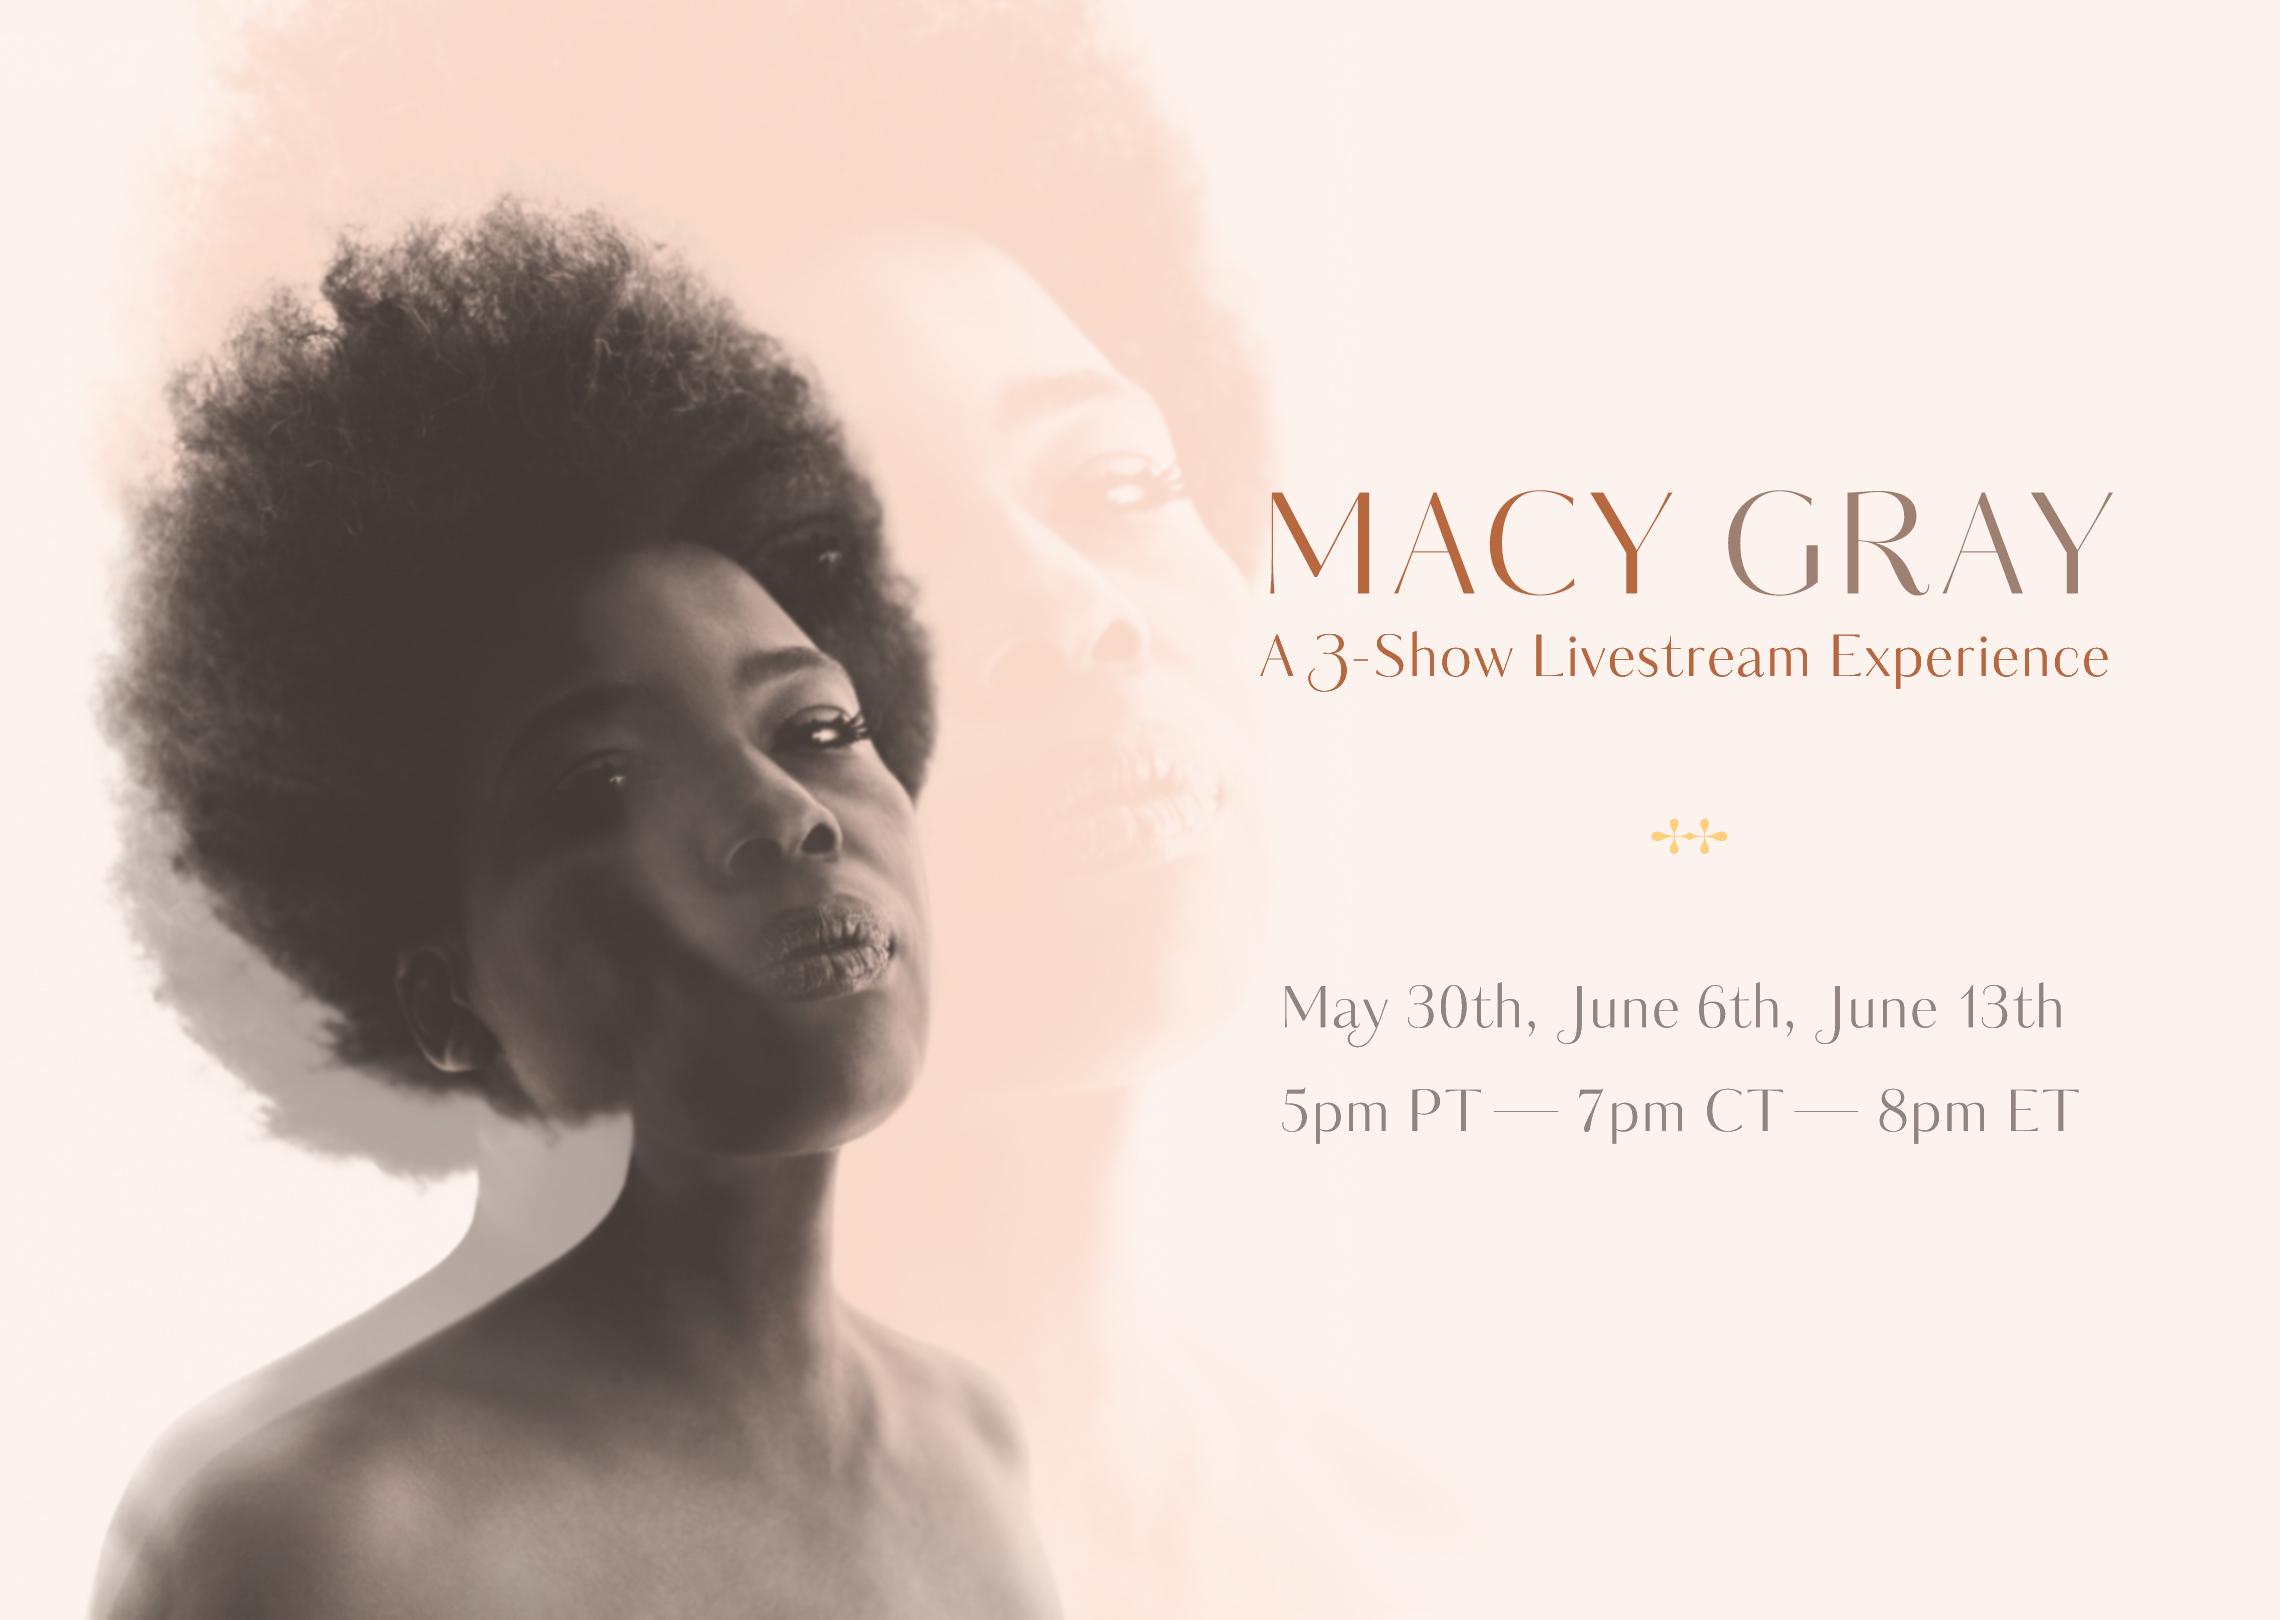 Macy Gray - Online